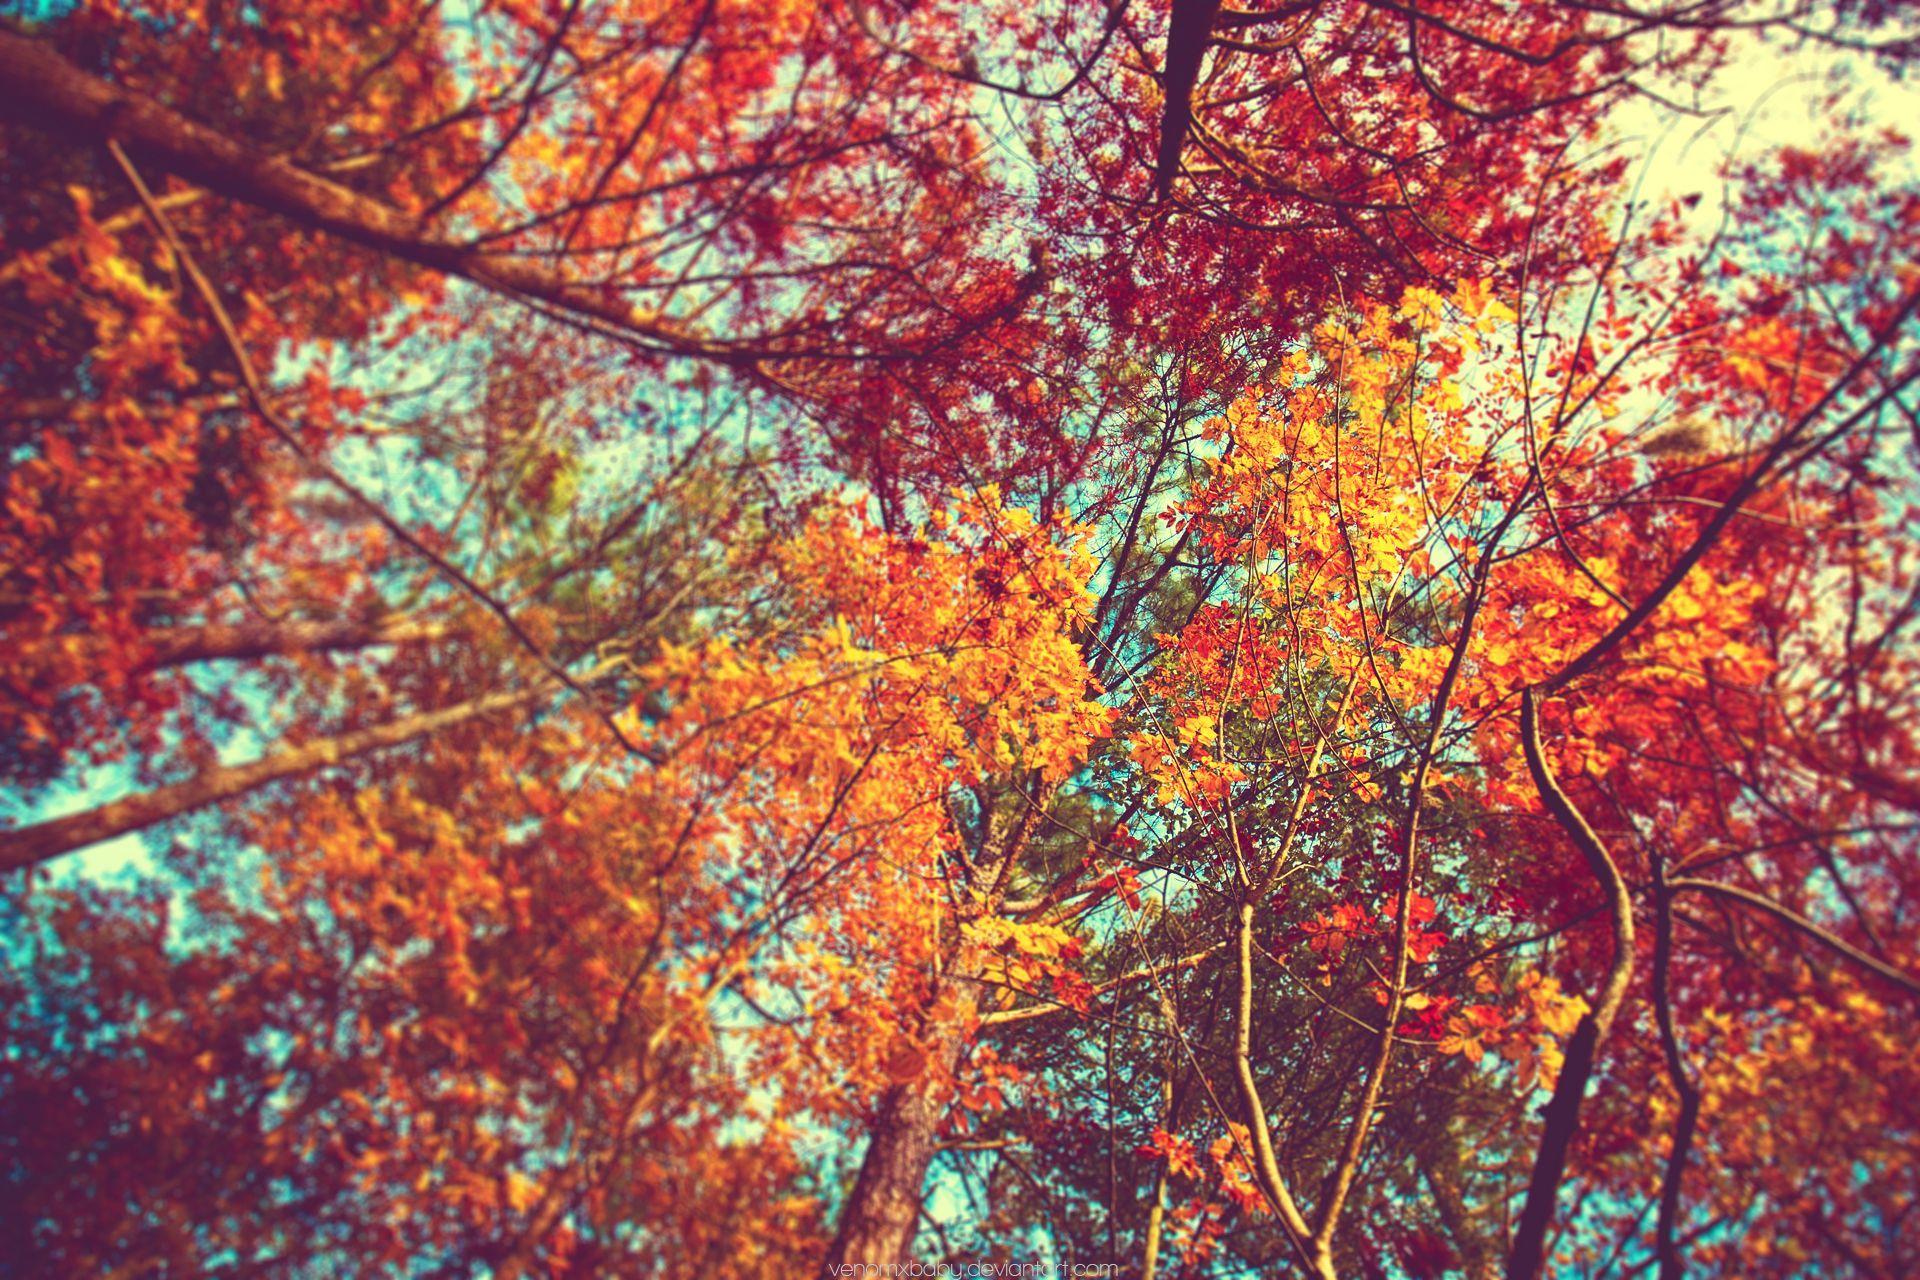 Pin By Maya On Vibe Autumn Tumblr Fall Wallpaper Tumblr Fall Wallpaper